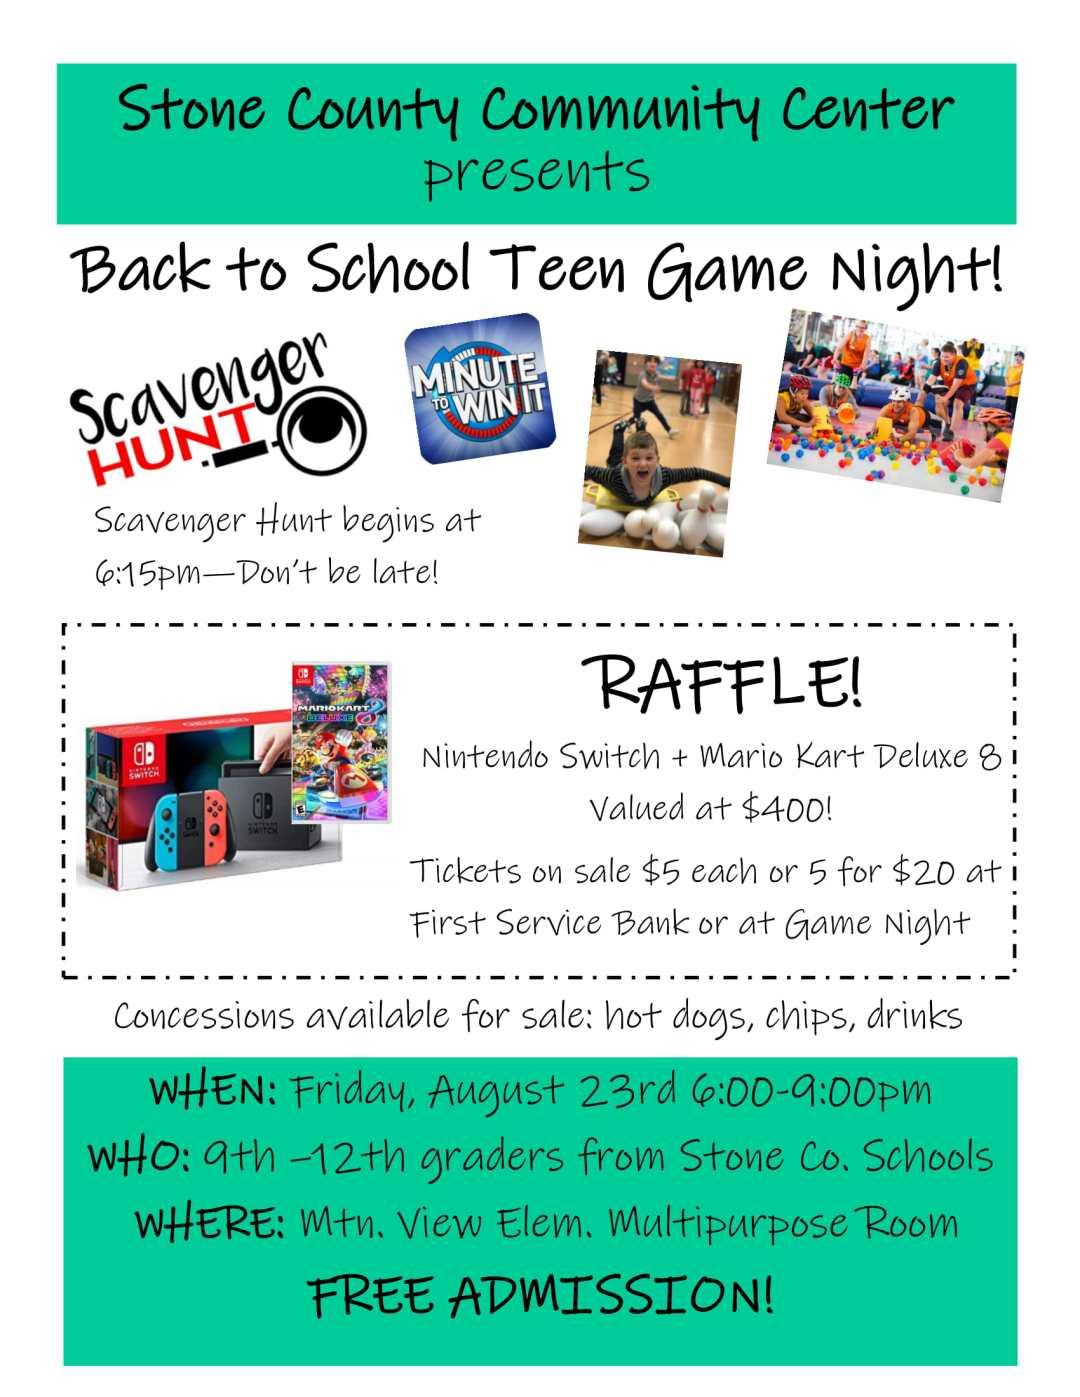 Back to School Teen Game Night! 1